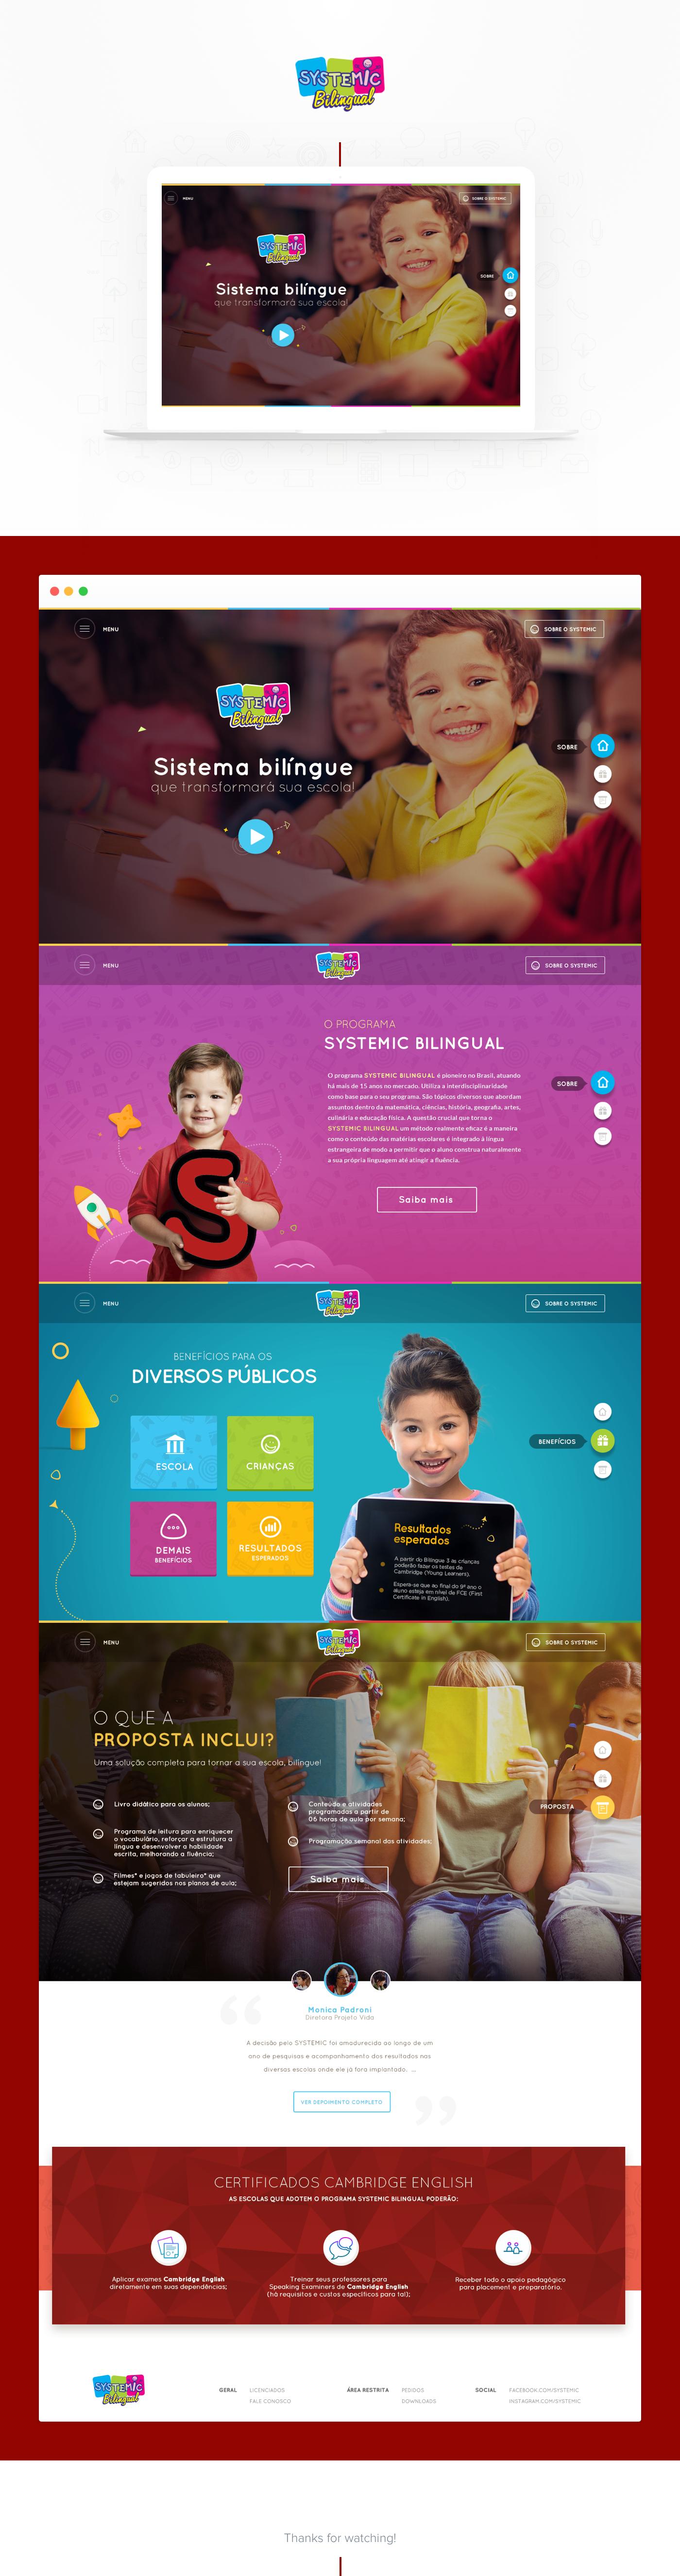 ux,UI,design,photoshop,system,front-end,back-end,responsivo